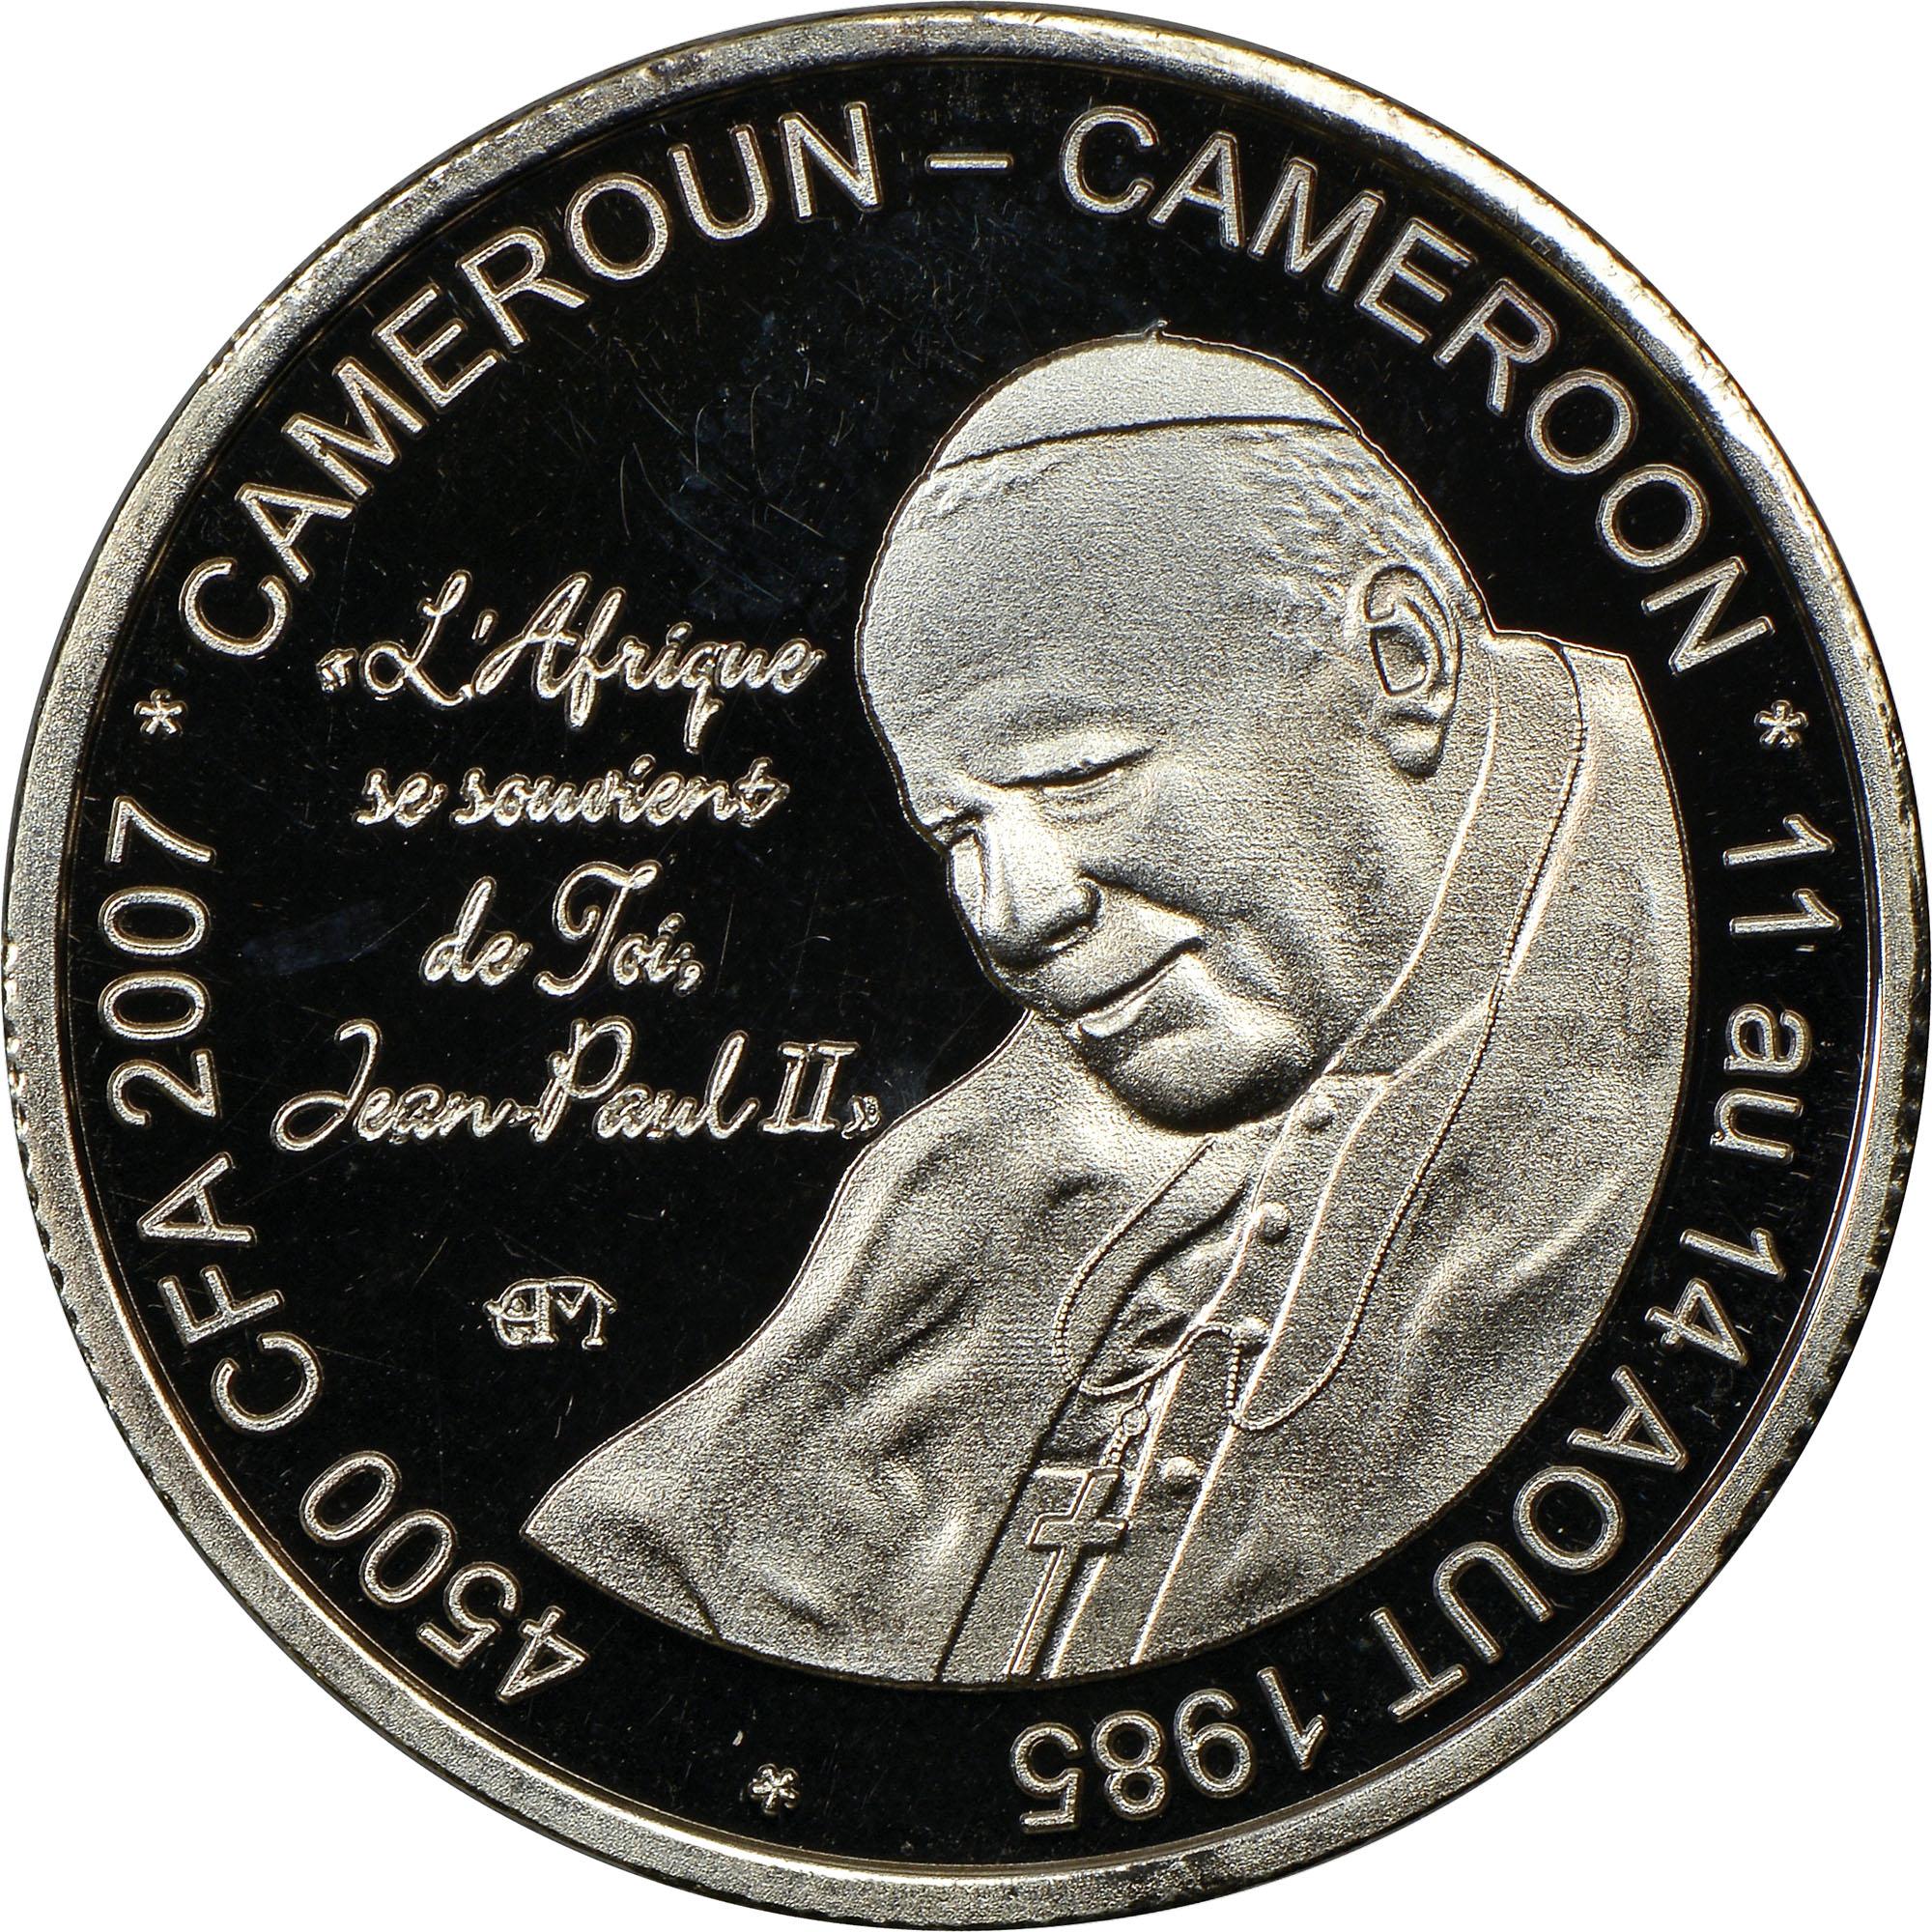 Cameroon 4500 CFA Francs-3 Africa obverse